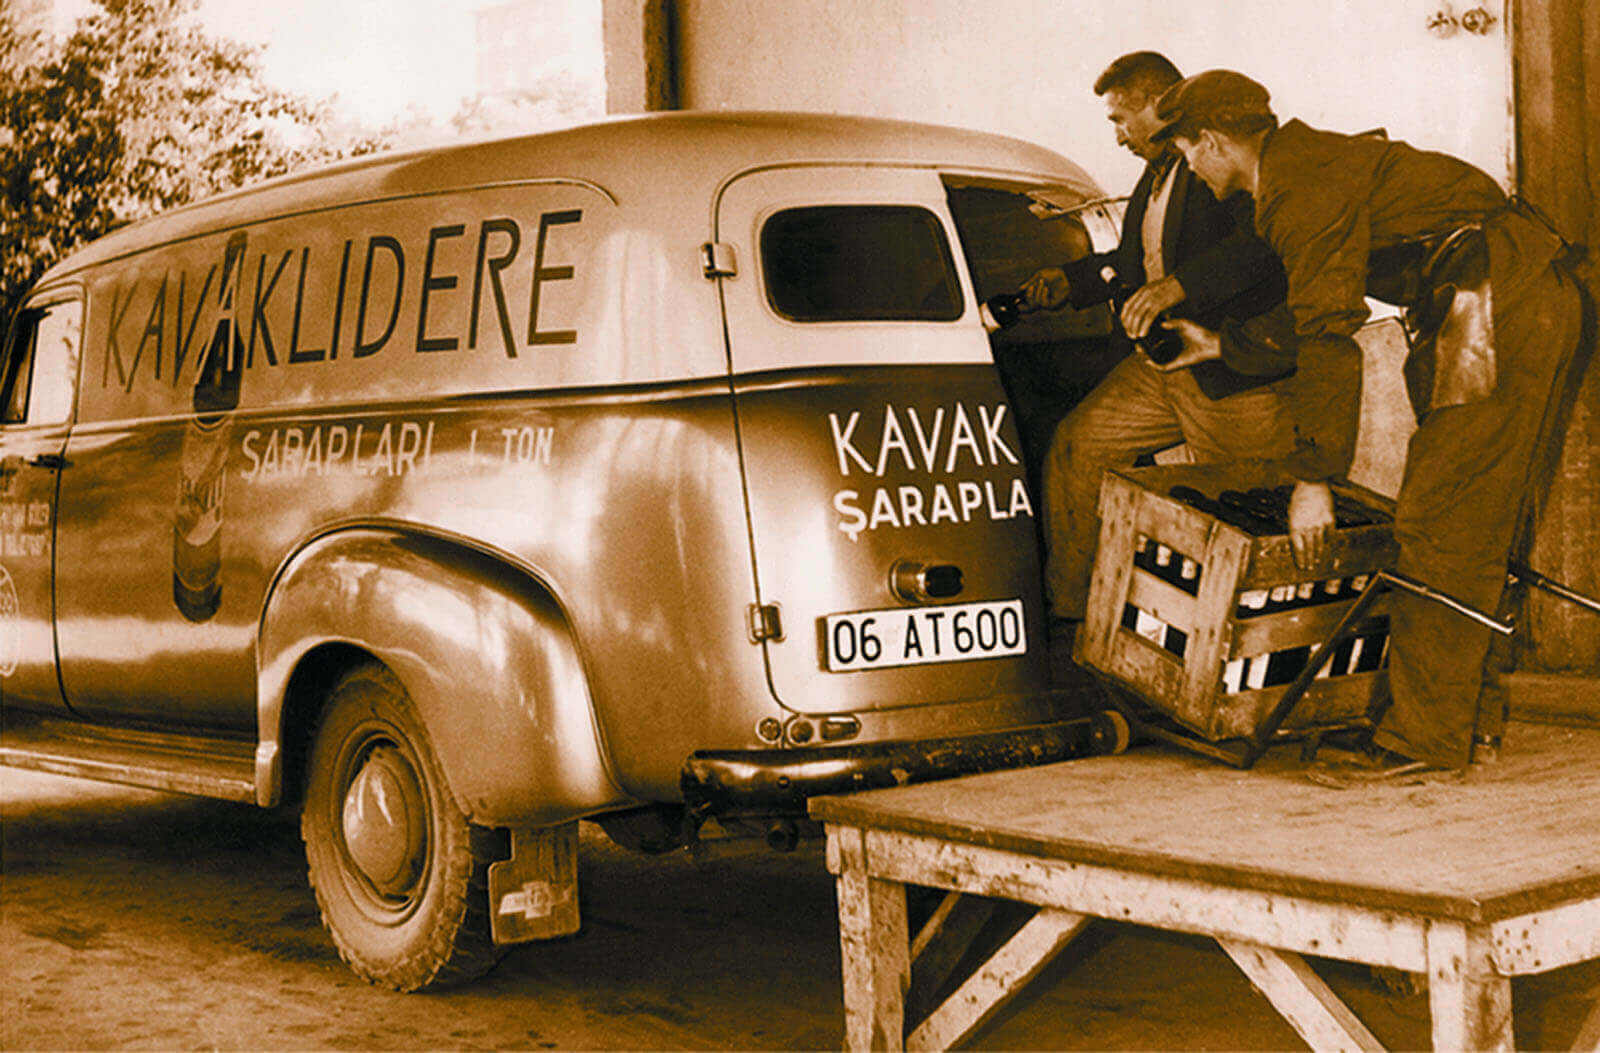 kavaklidere vīna piegādes furgons